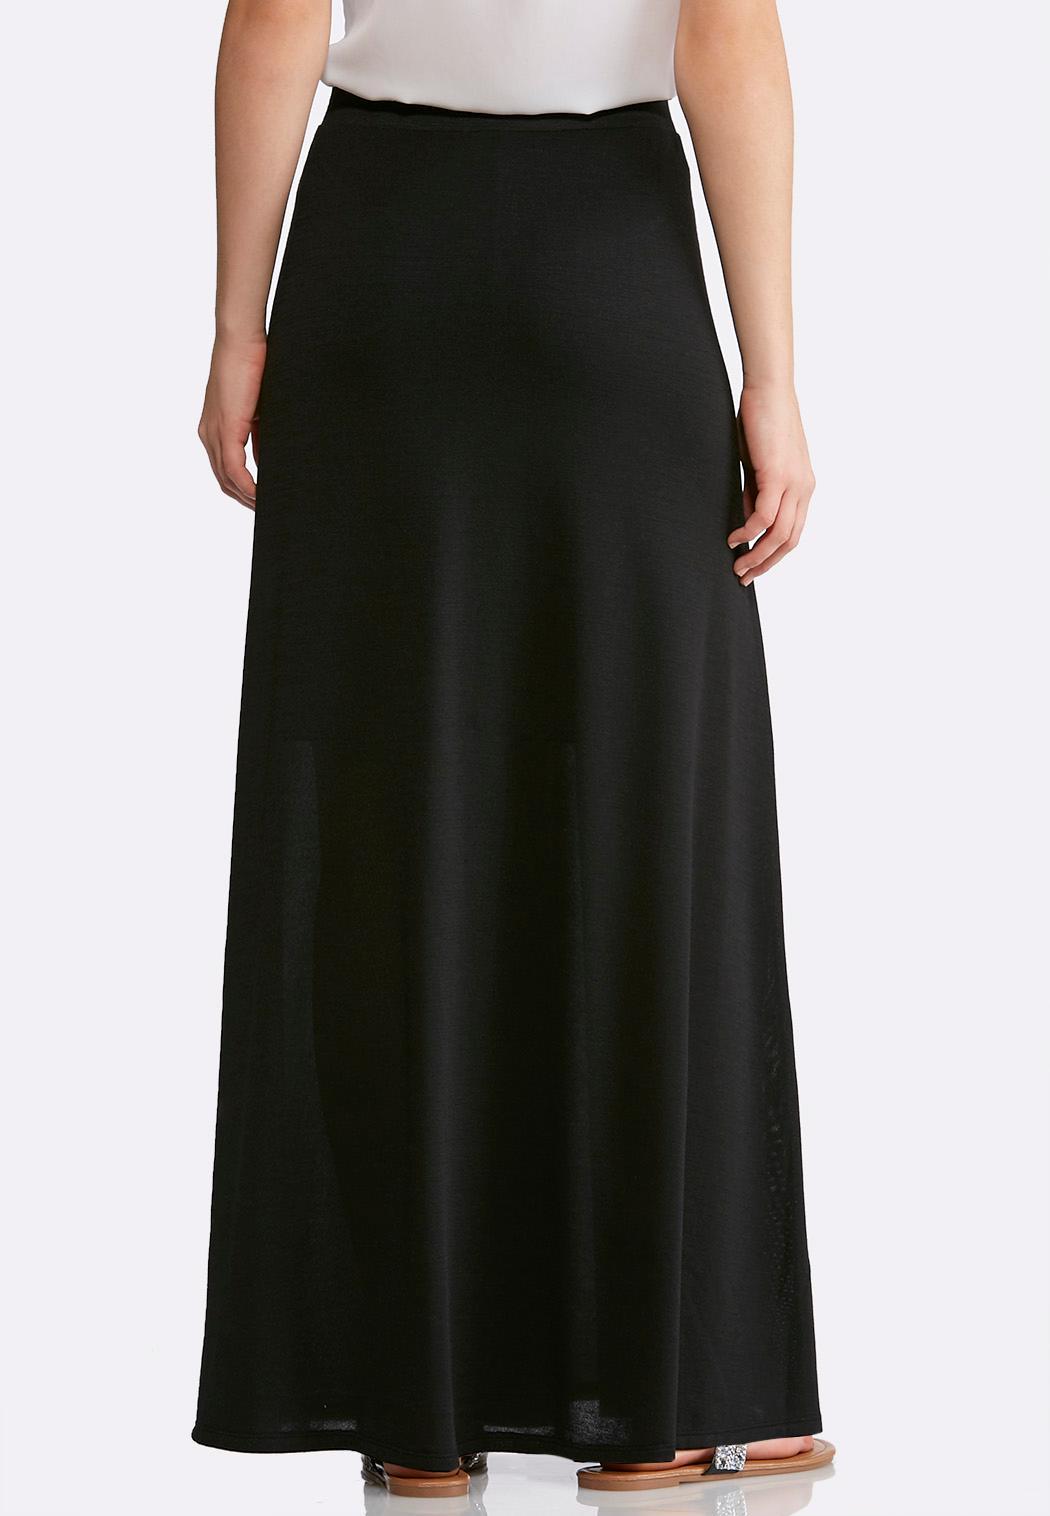 Plus Size Black Hacci Maxi Skirt (Item #43994403)